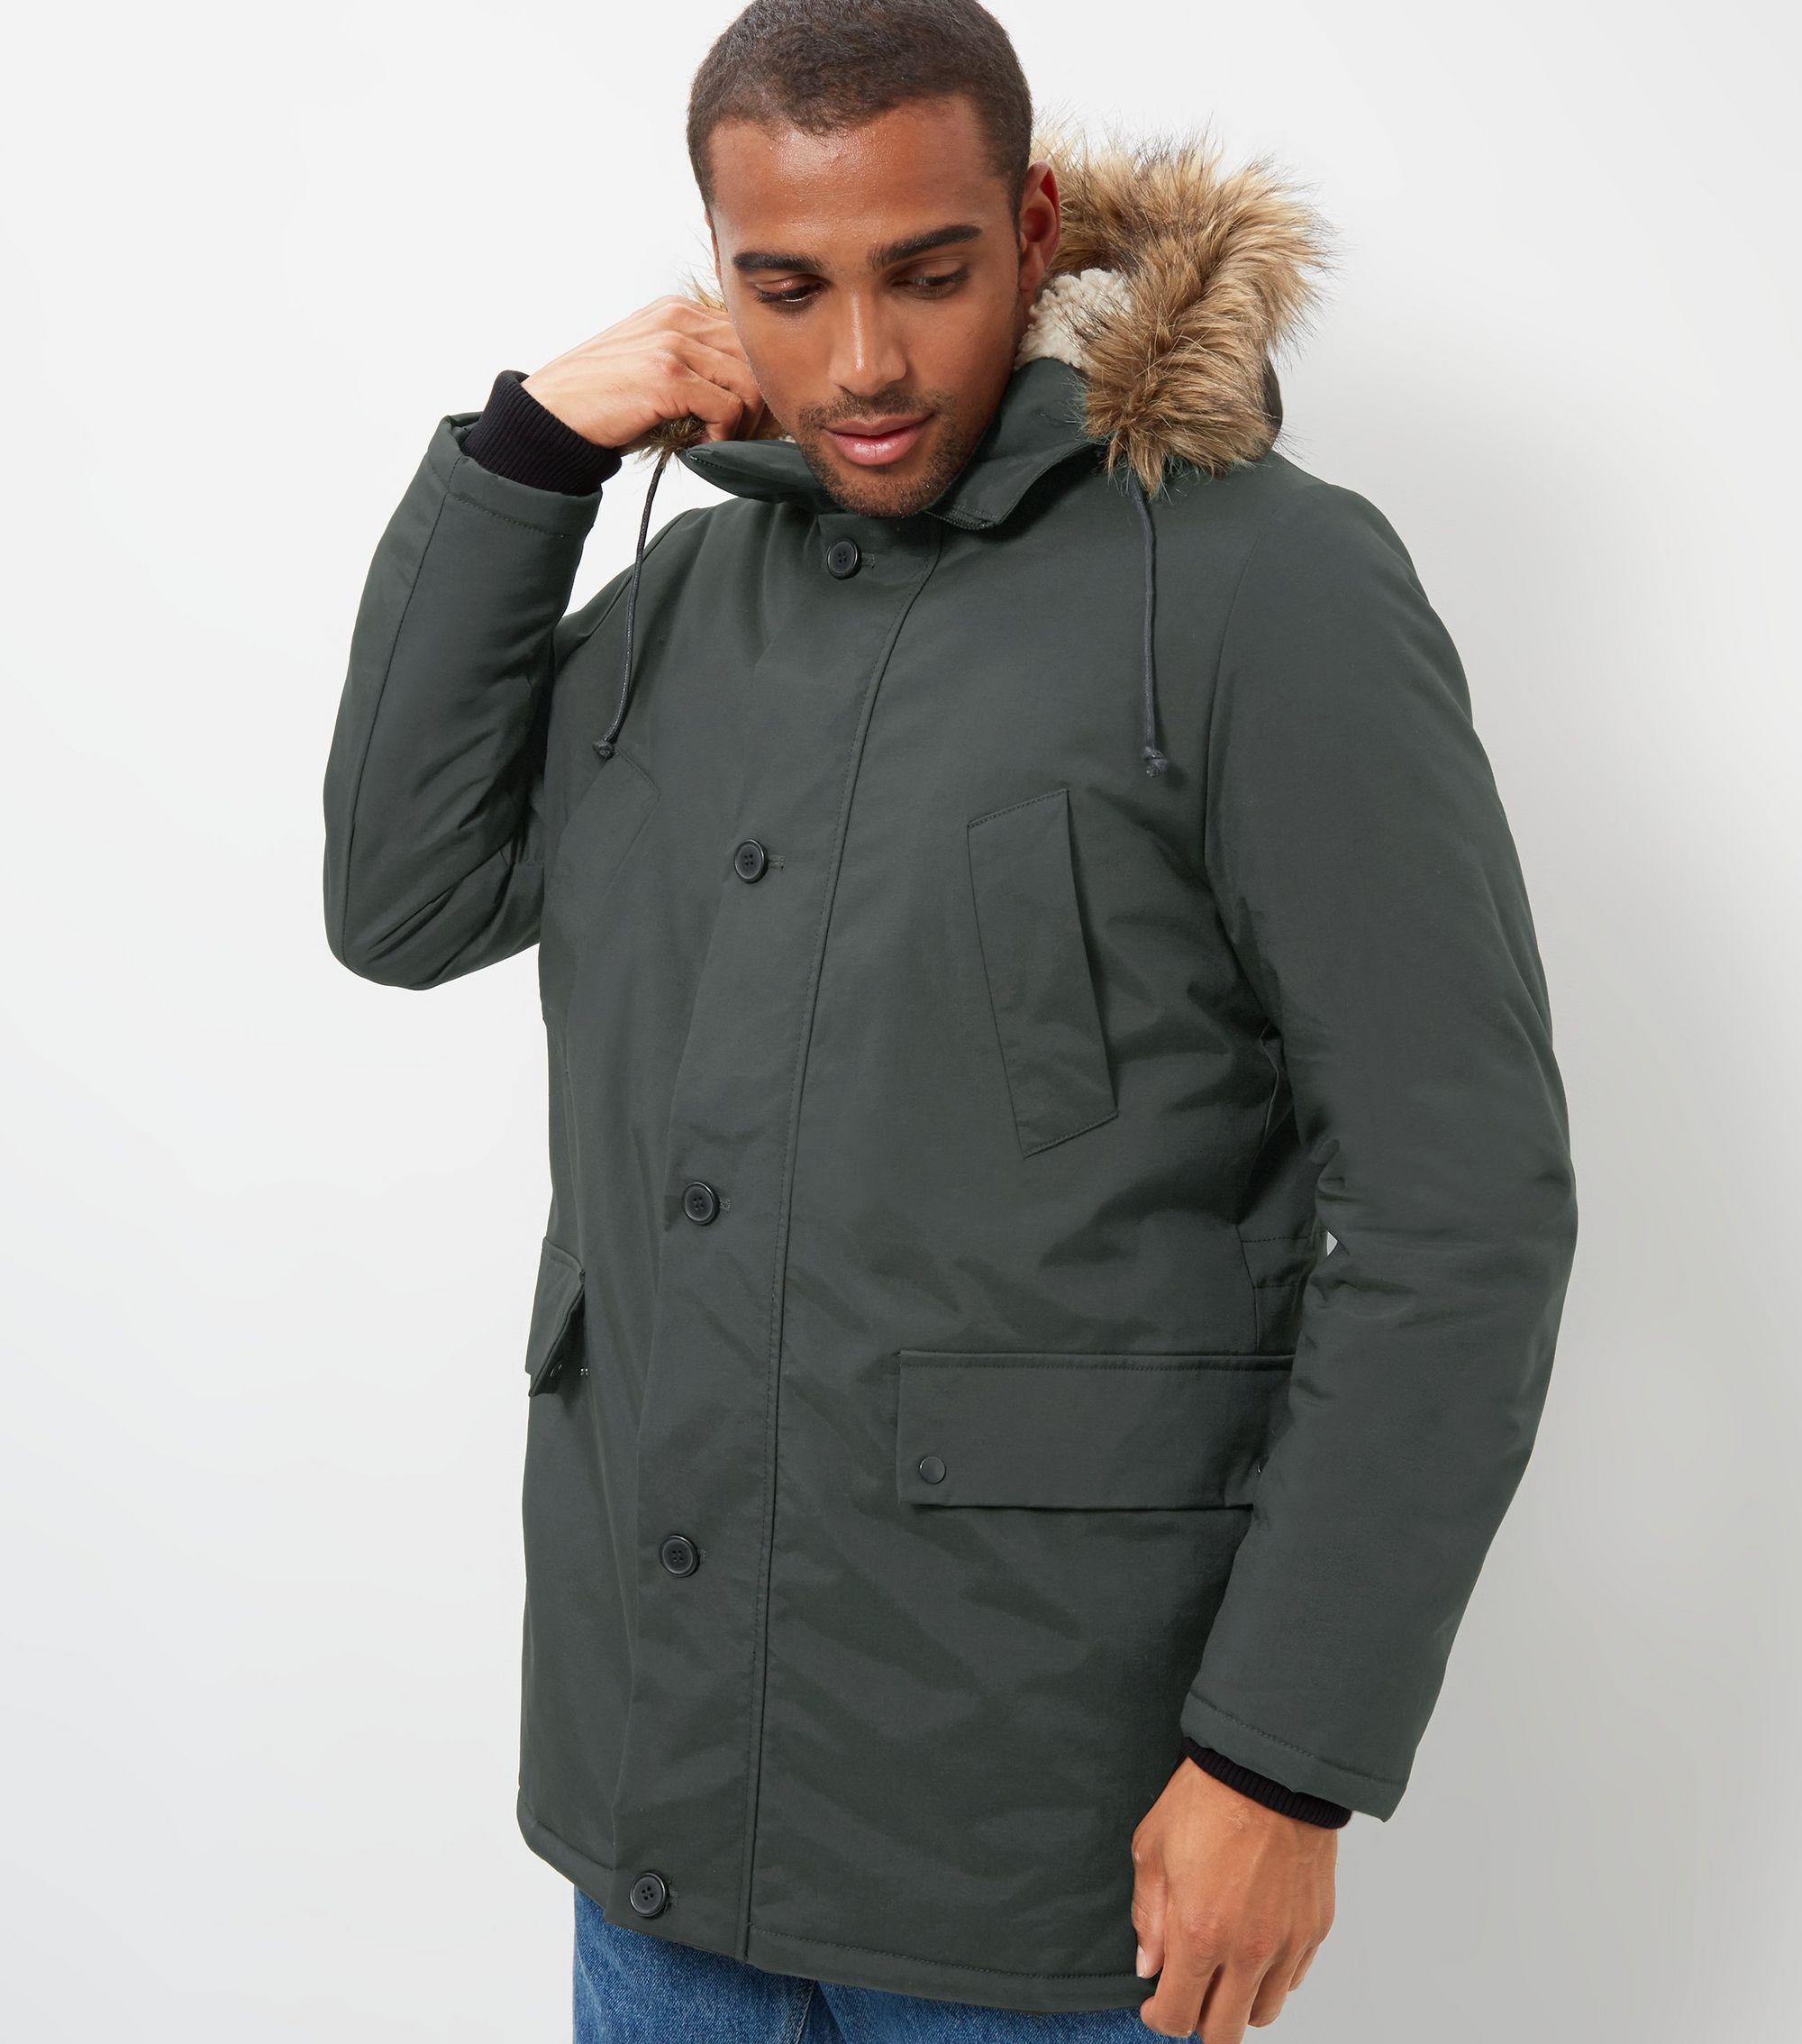 http://media.newlookassets.com/i/newlook/387762434/mens/jackets-and-coats/coats/khaki-faux-fur-trim-hooded-parka/?$new_pdp_szoom_image_2000$